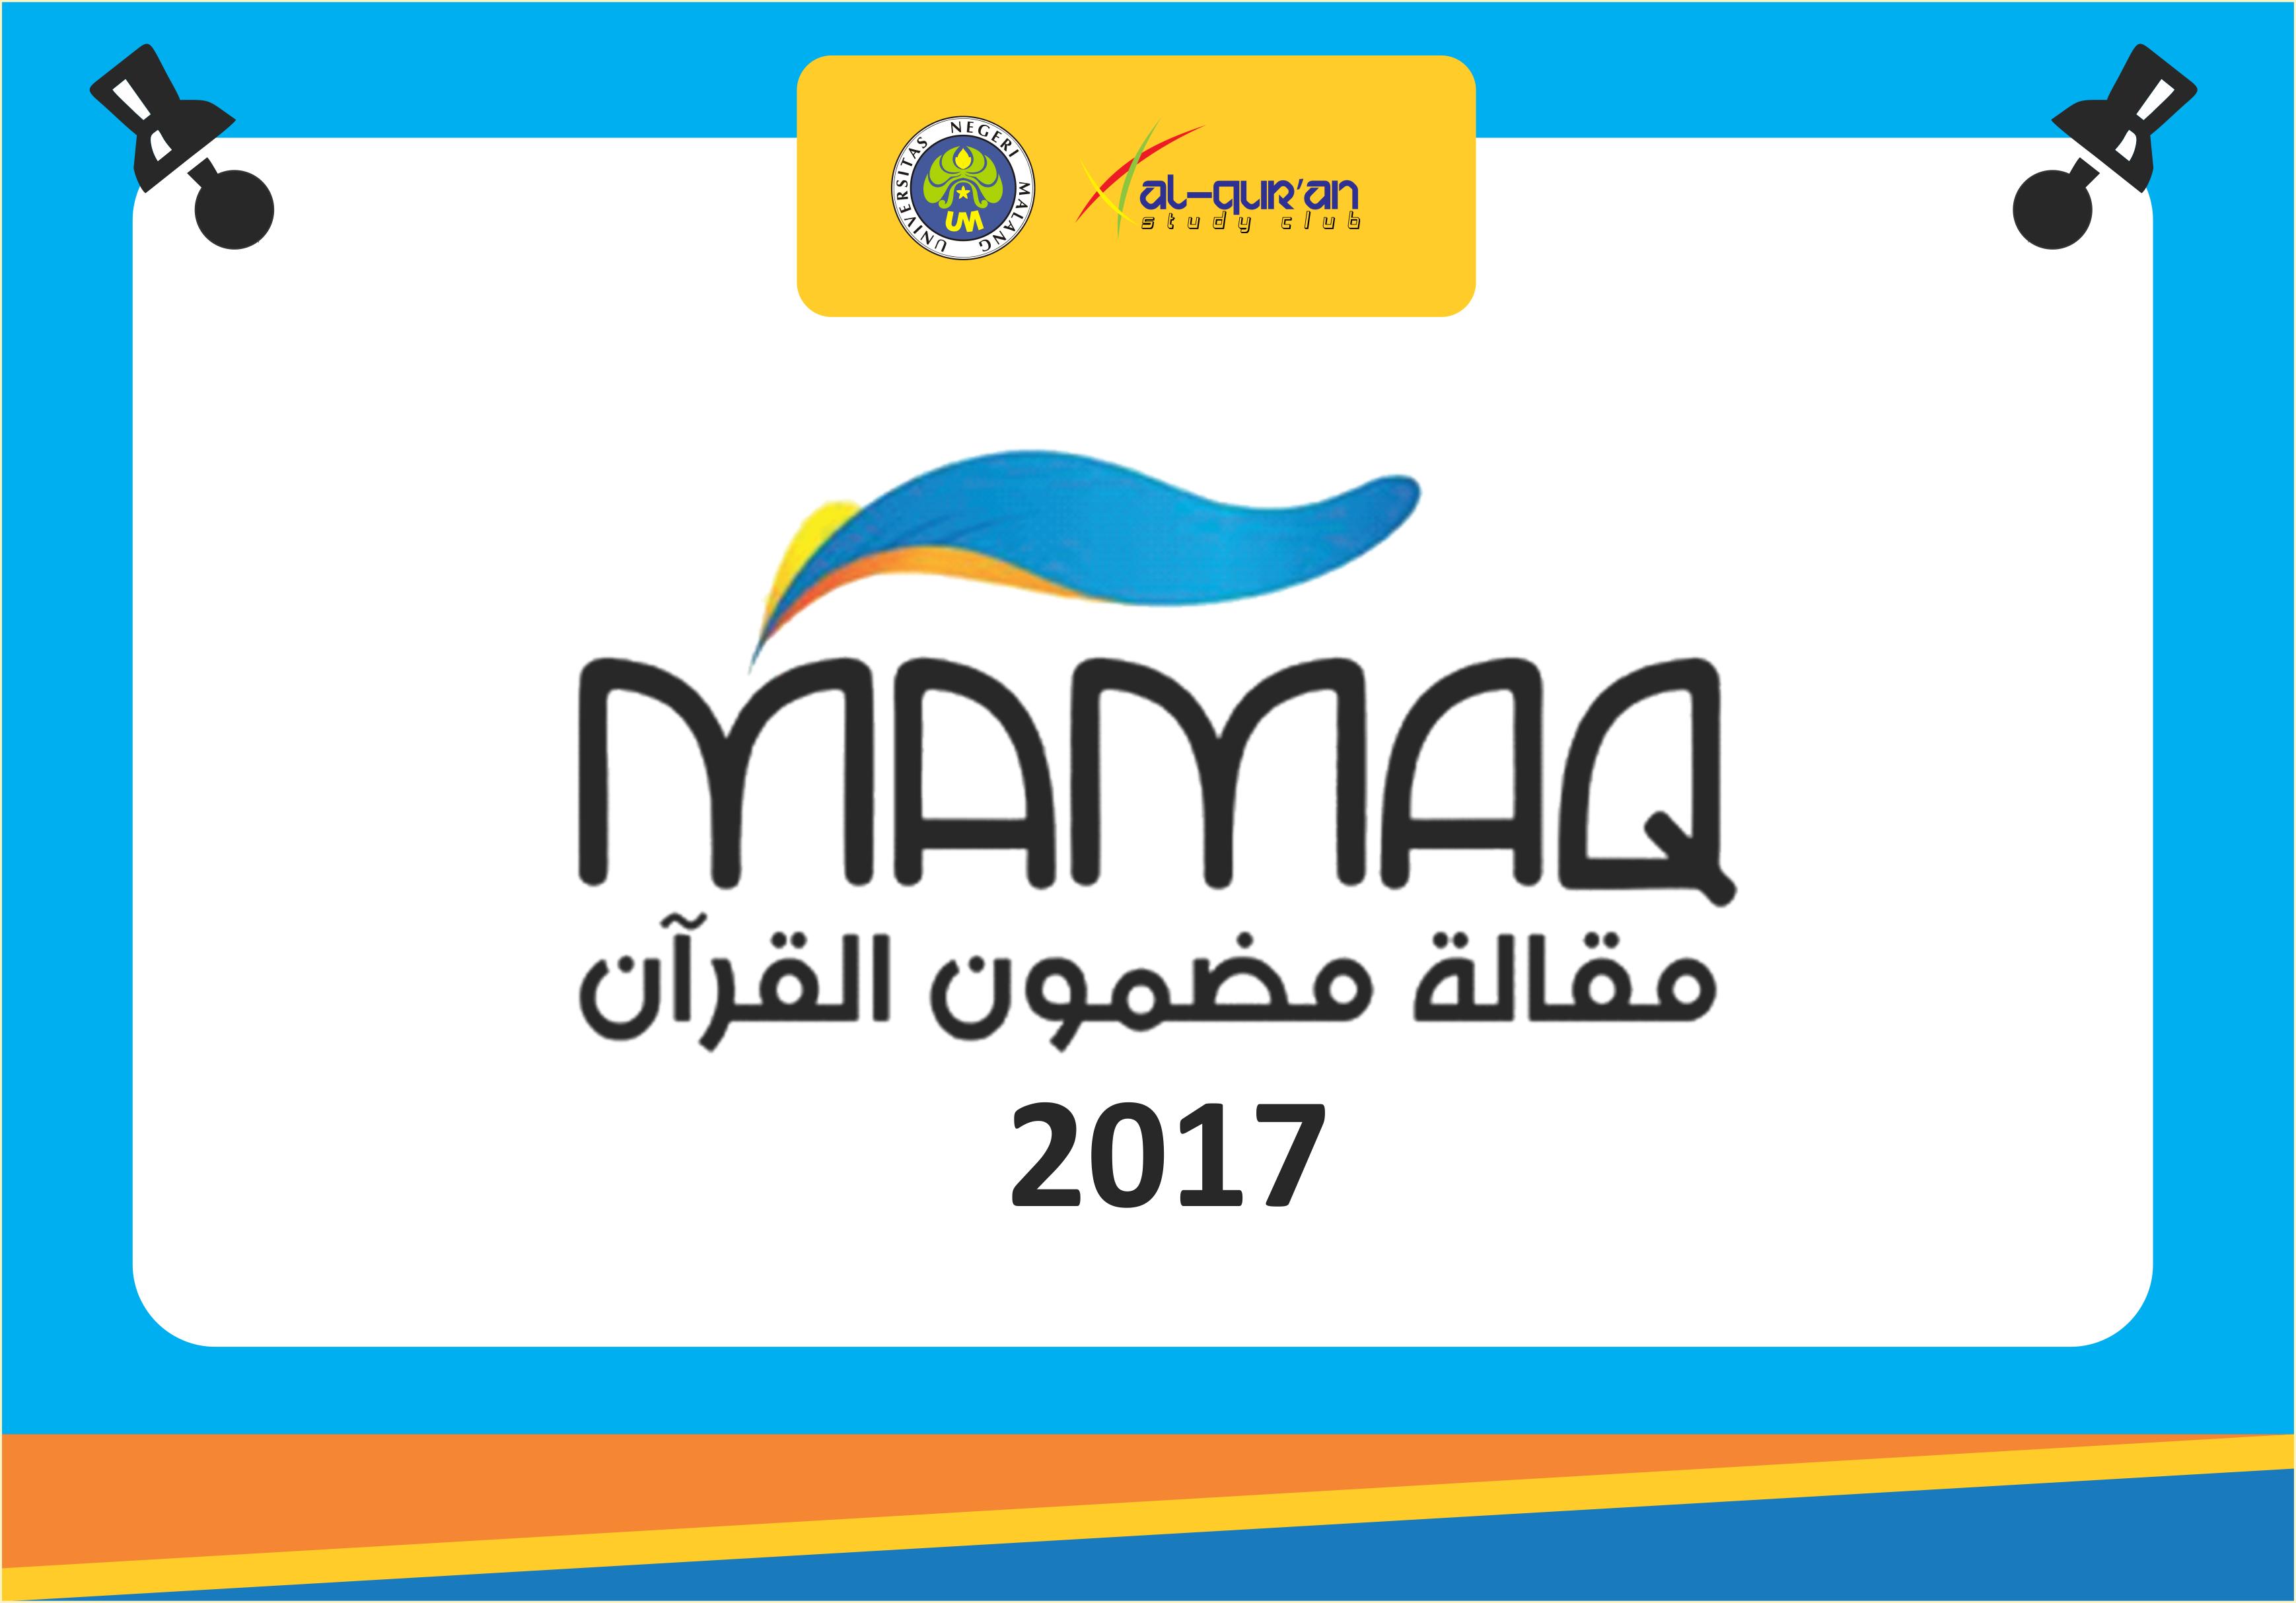 Pengumuman Lolos Fullpaper MAMAQ 2017